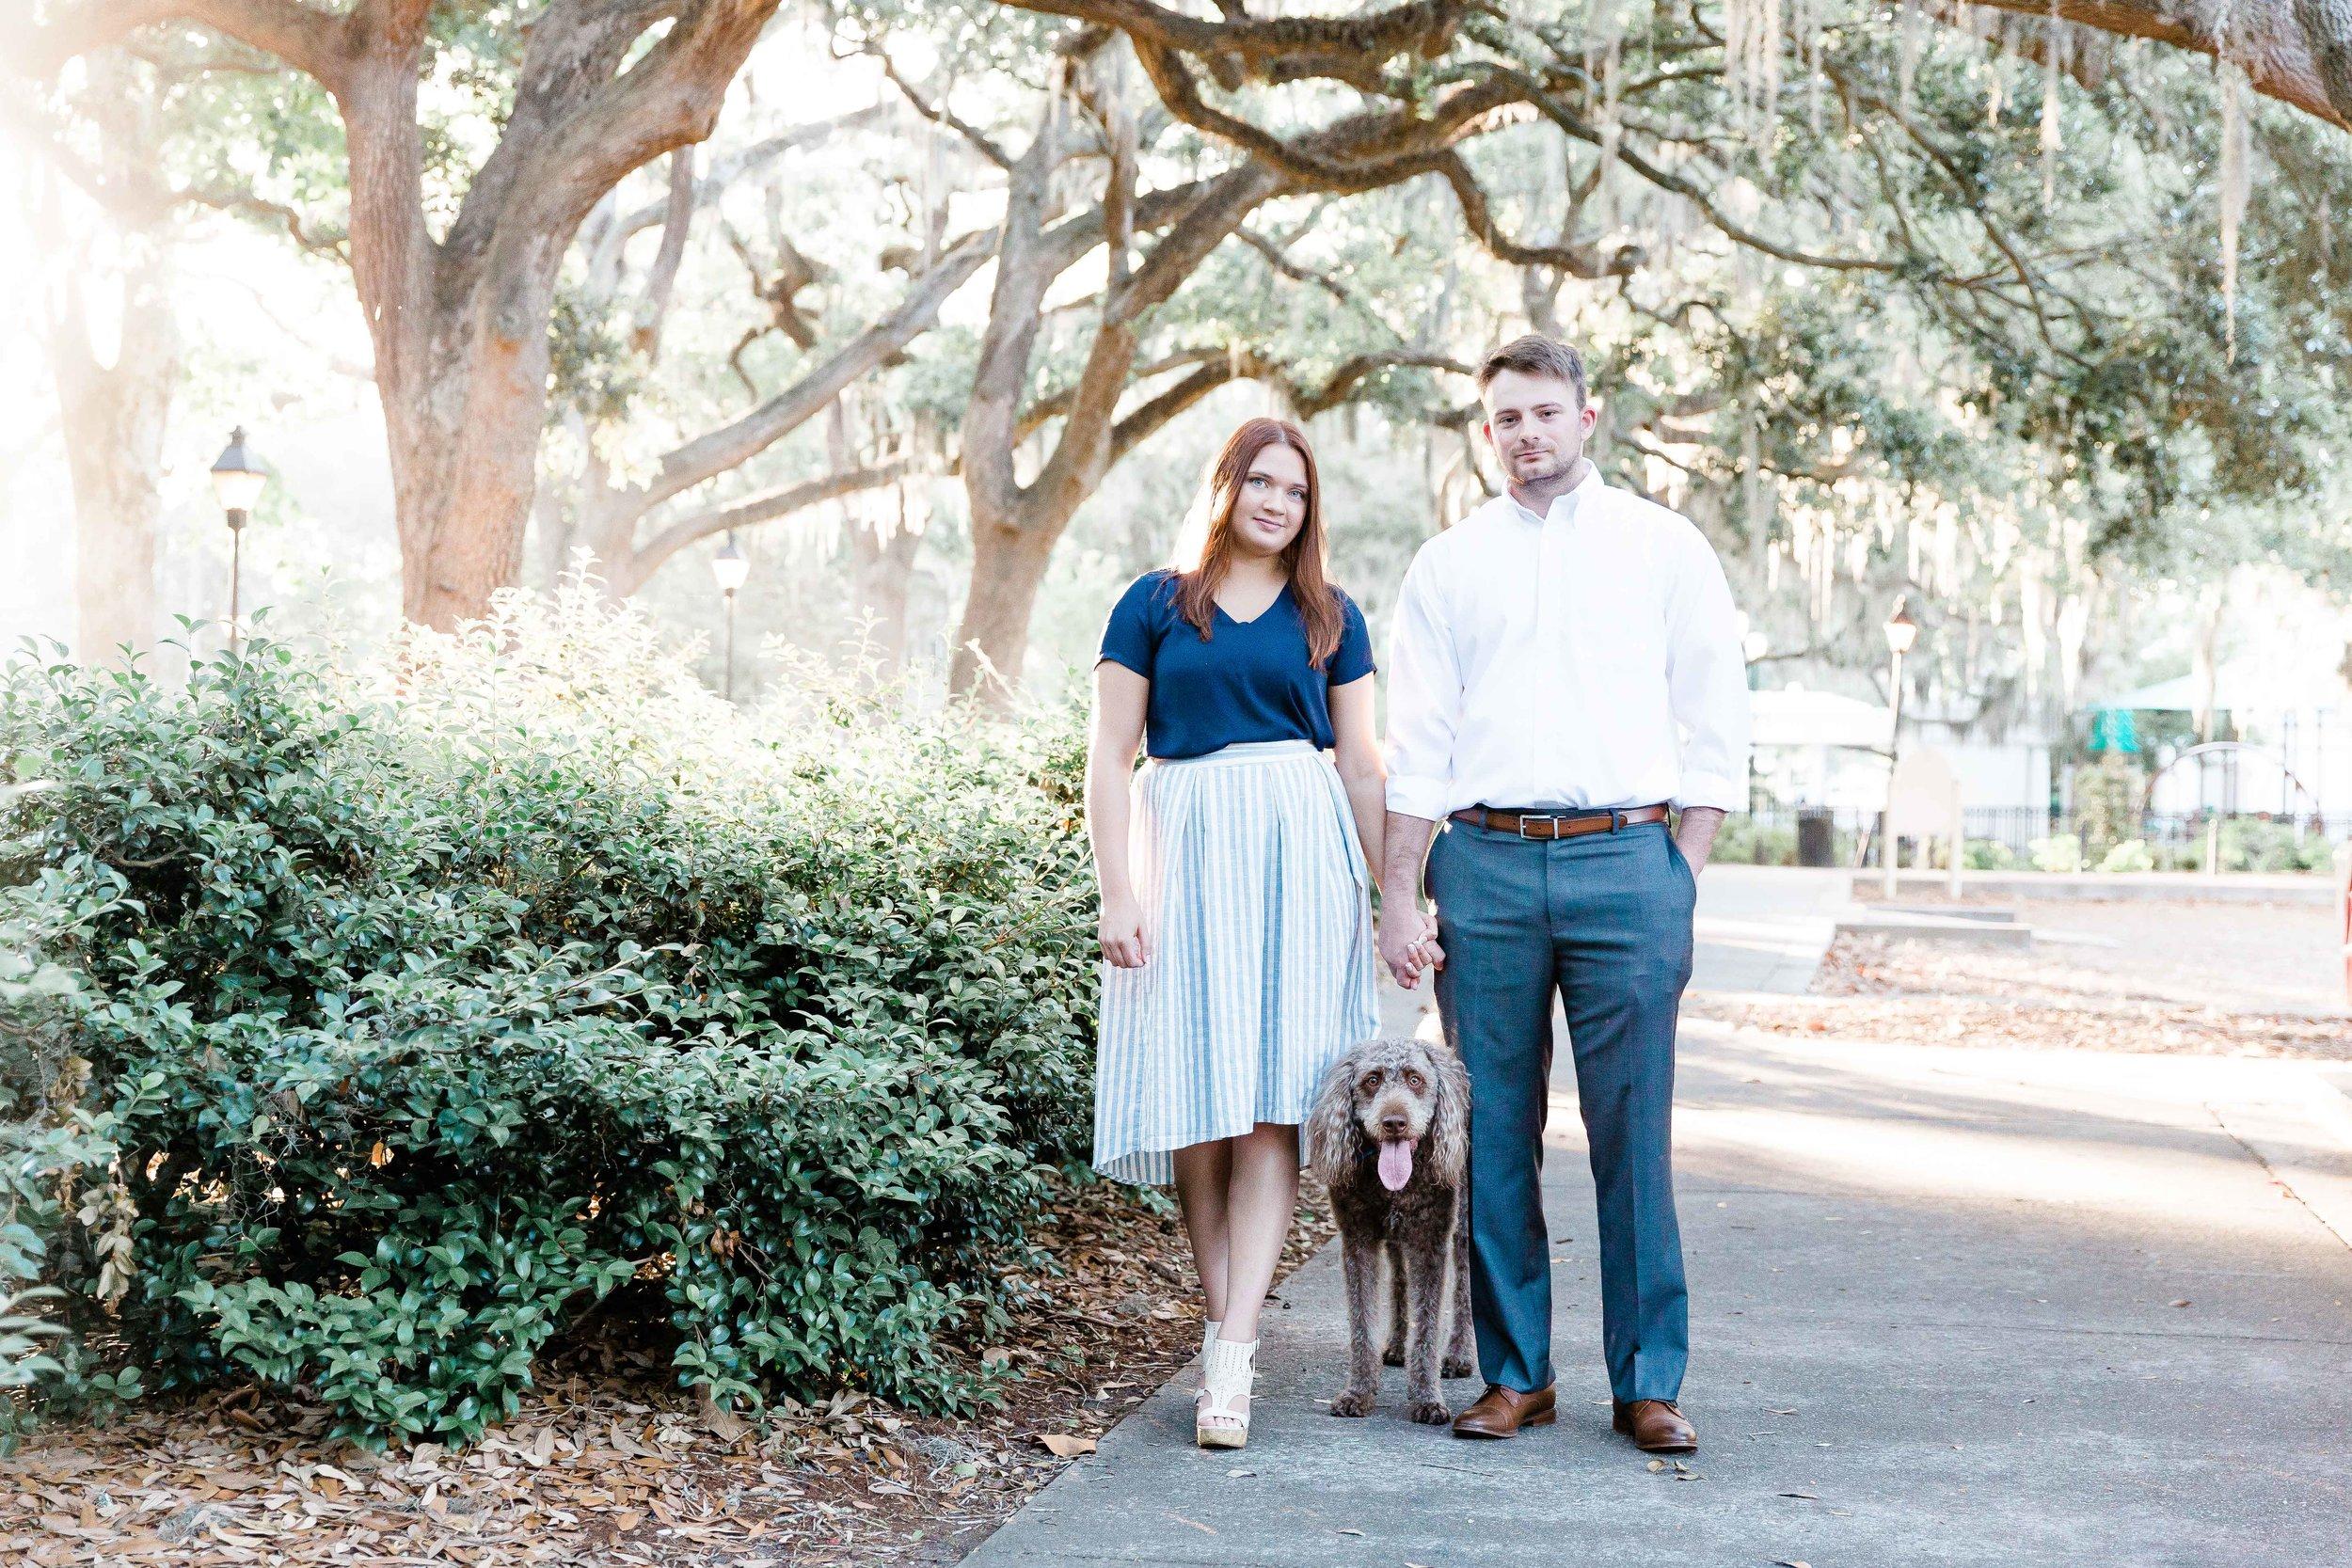 20190519Georgia-Savannah-Kristen & Zach-Forsyth Park-Lafayette Square04.jpg